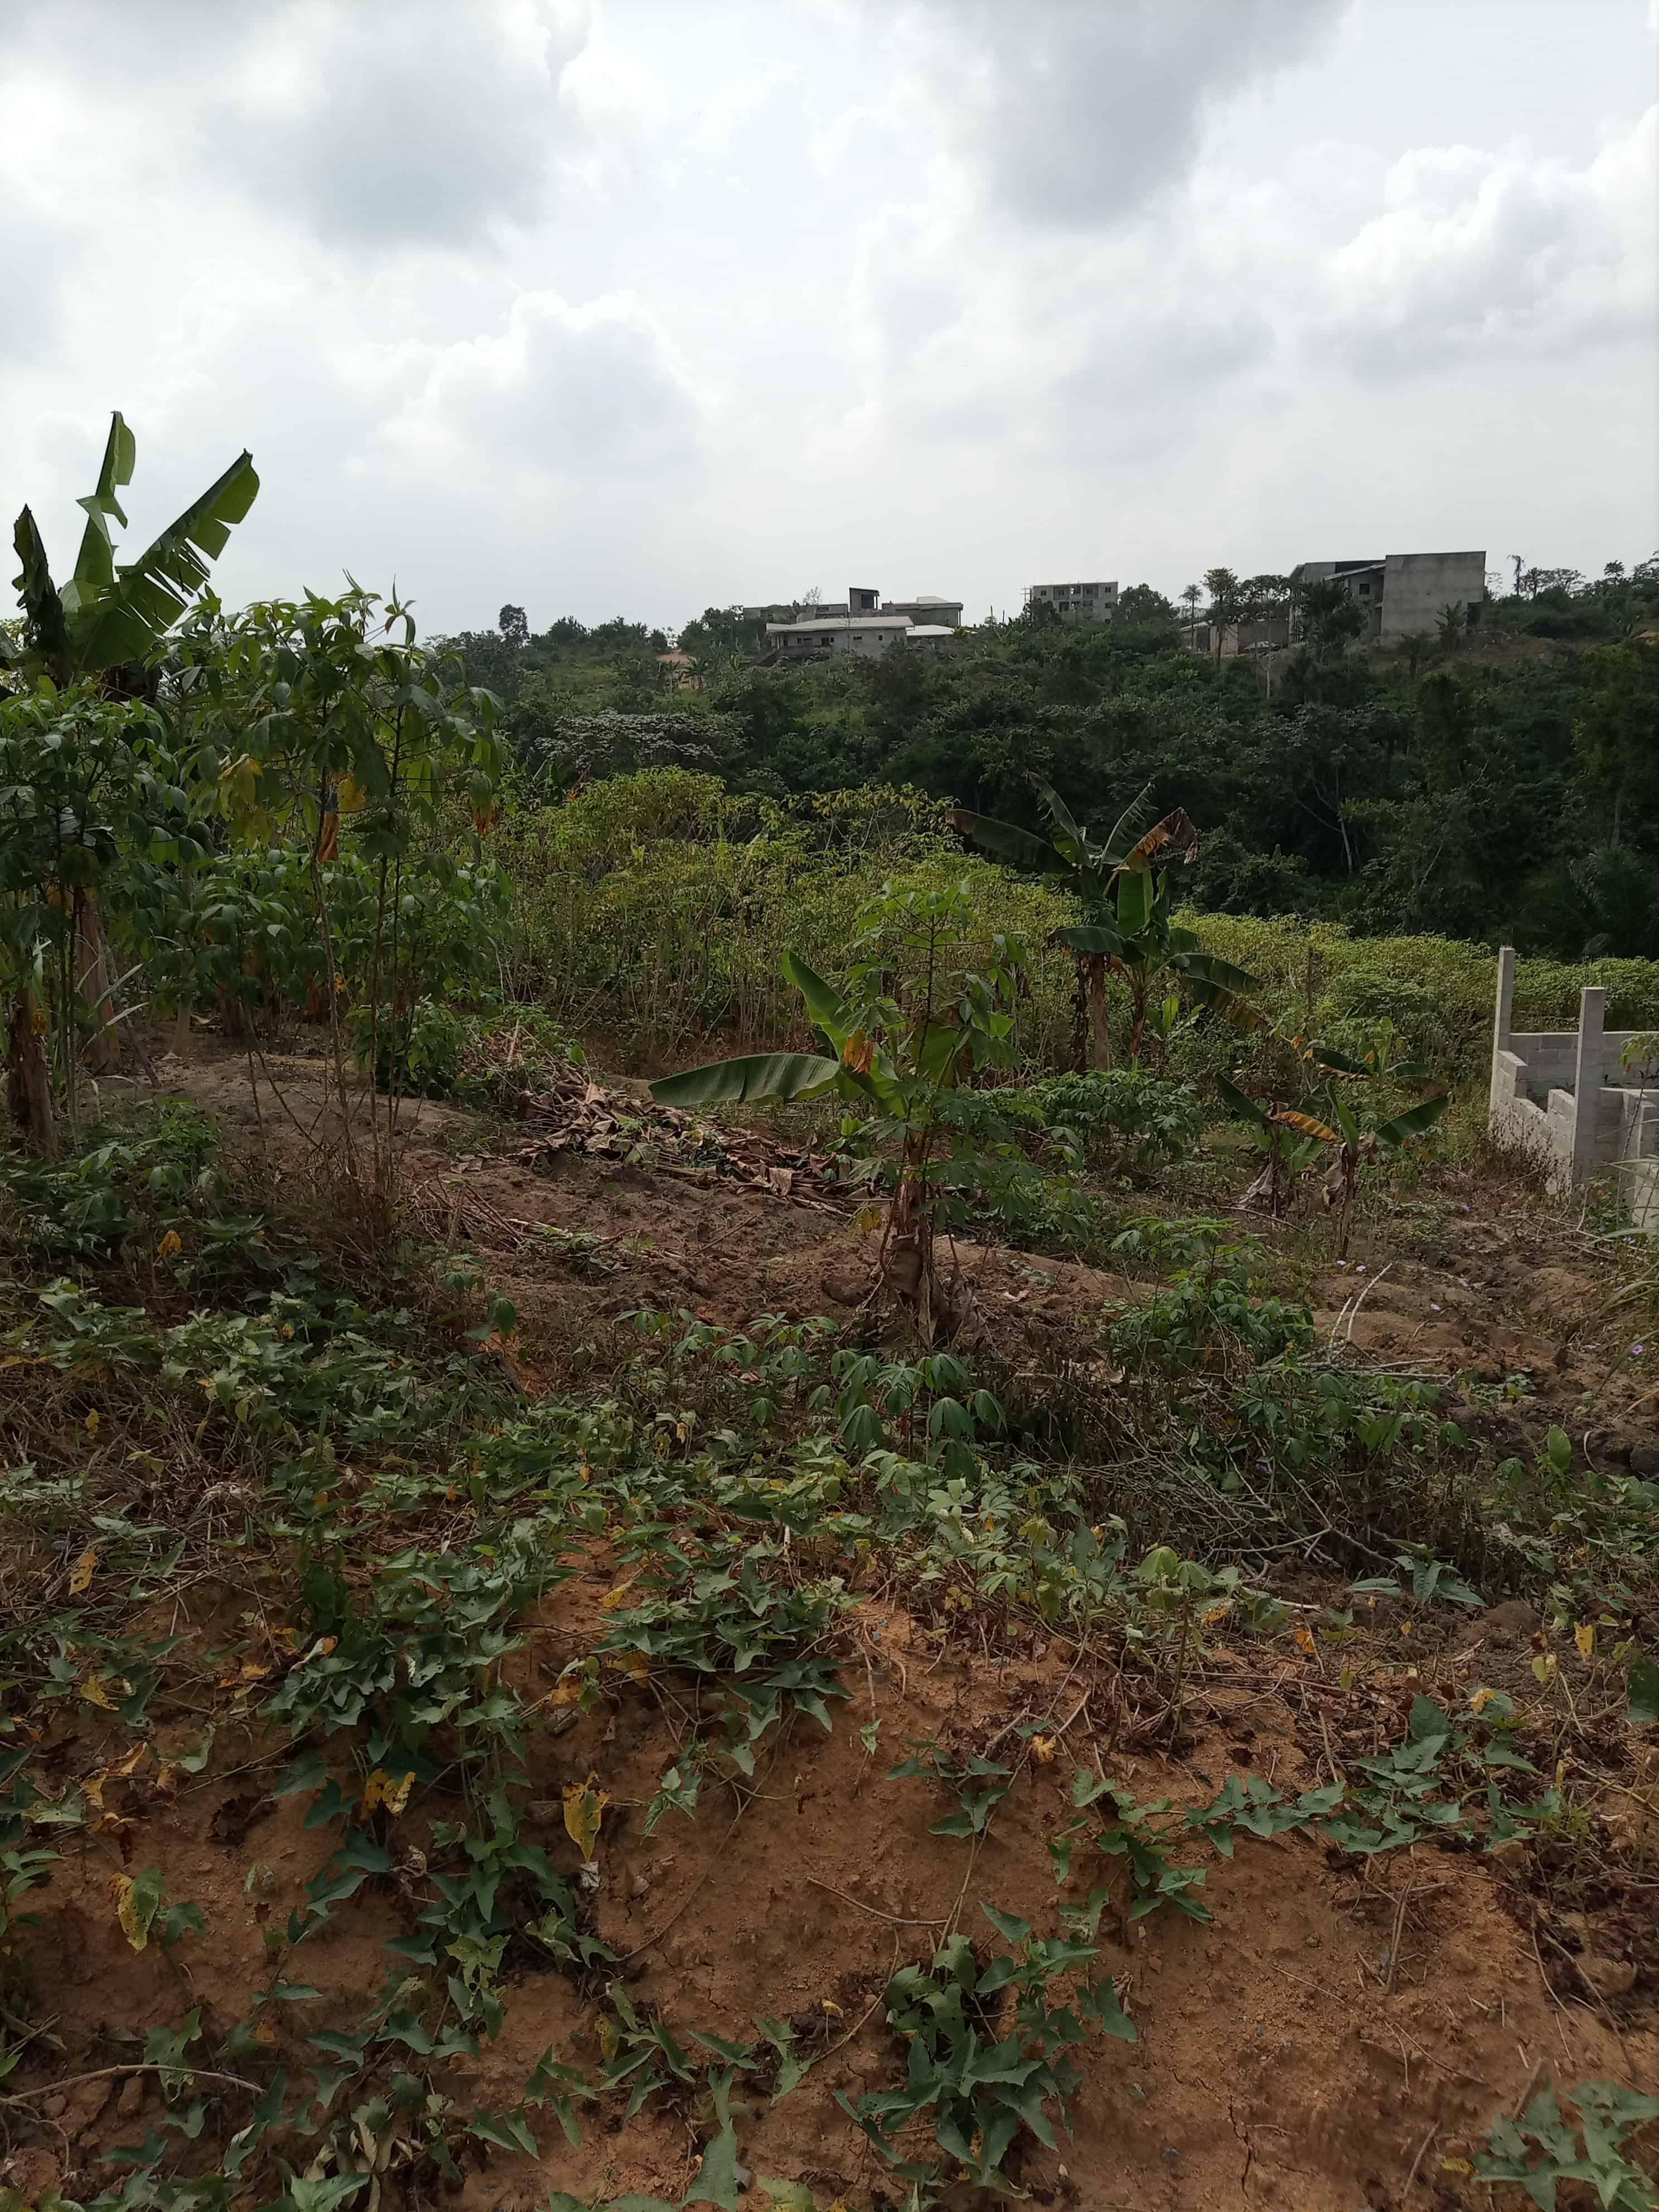 Land for sale at Douala, Logbessou I, Ver le carrefour Njoya - 600 m2 - 60 000 000 FCFA